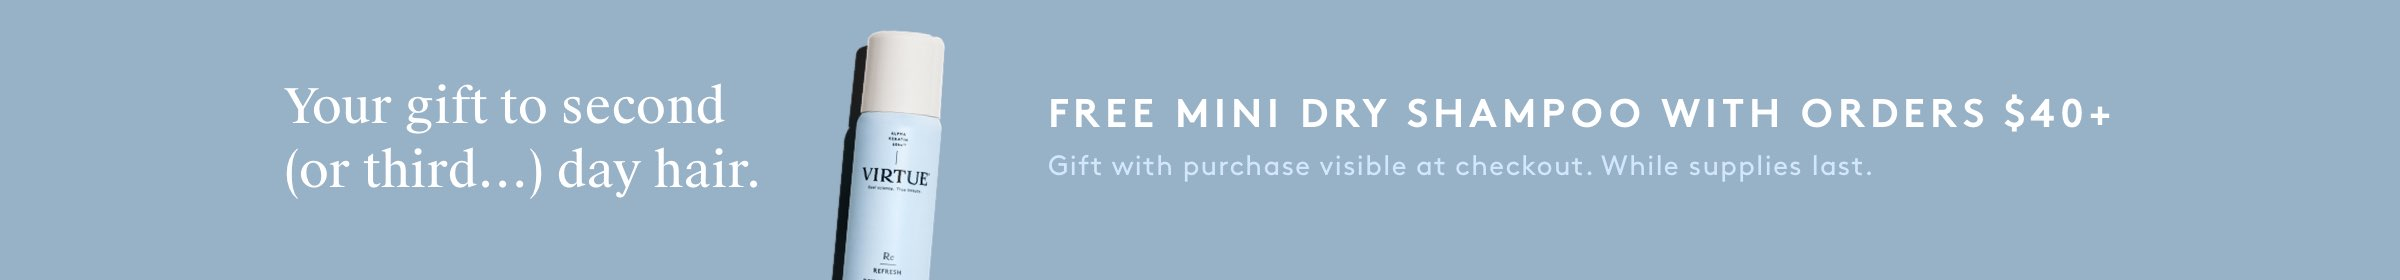 Free Mini Dry Shampoo with orders $40+